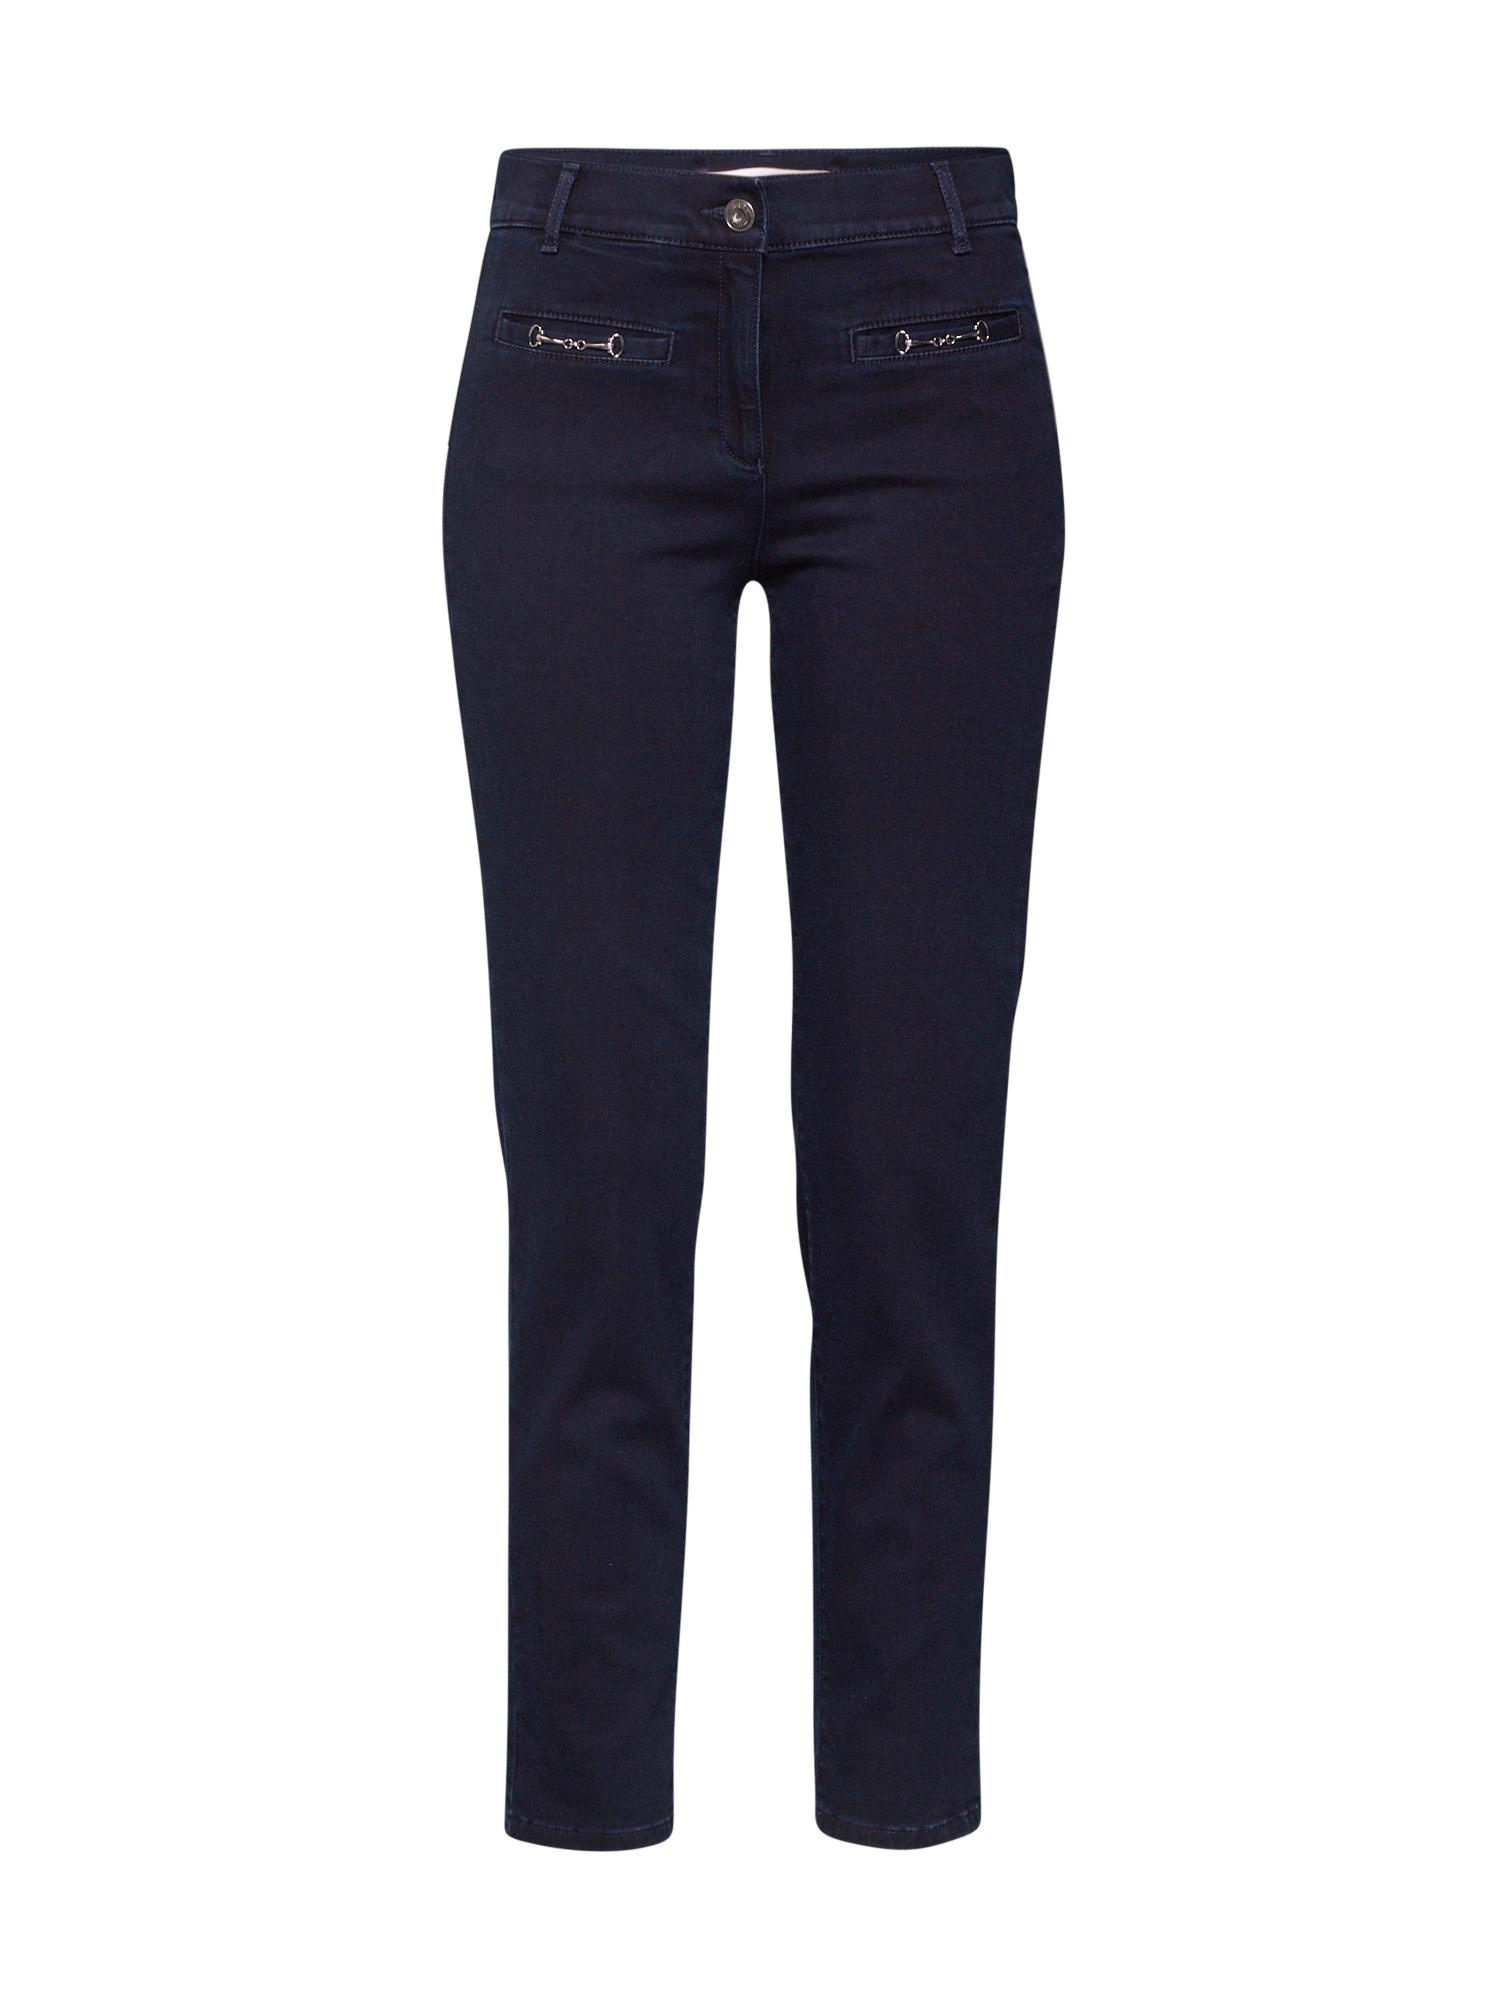 BRAX Džinsai 'SIDNEYS' tamsiai (džinso) mėlyna / tamsiai mėlyna